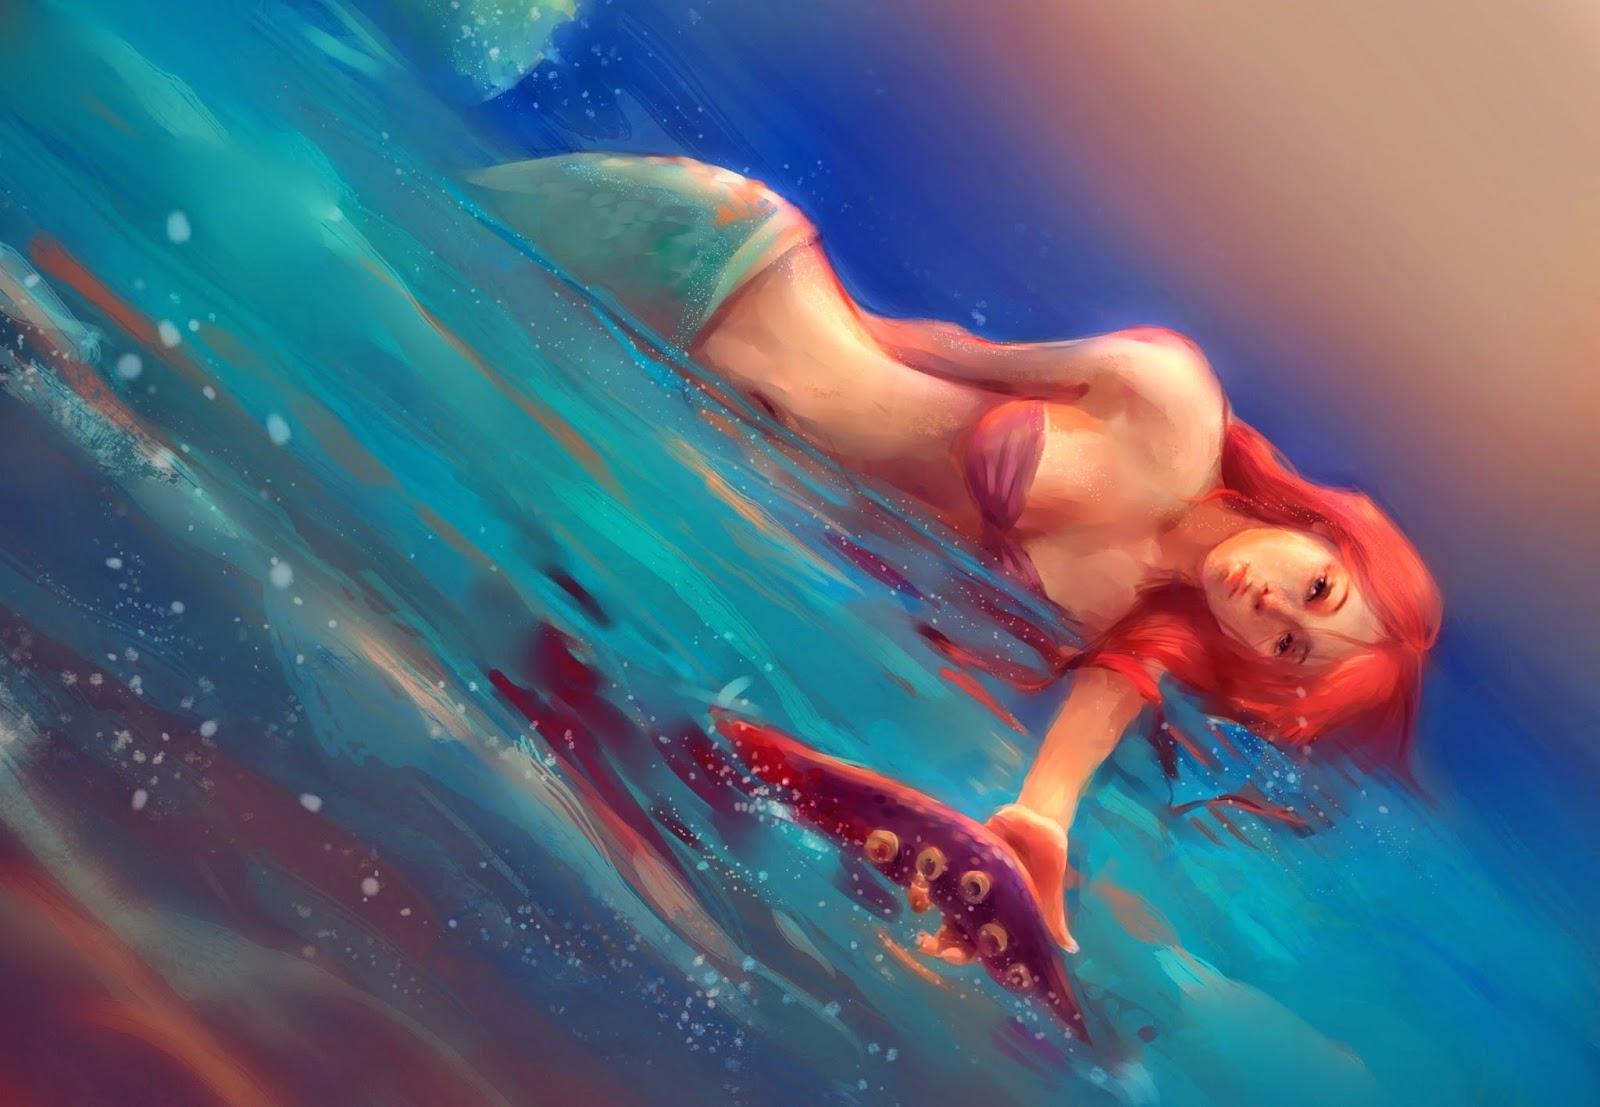 mermaid-painting-images-stock-photos-download.jpg